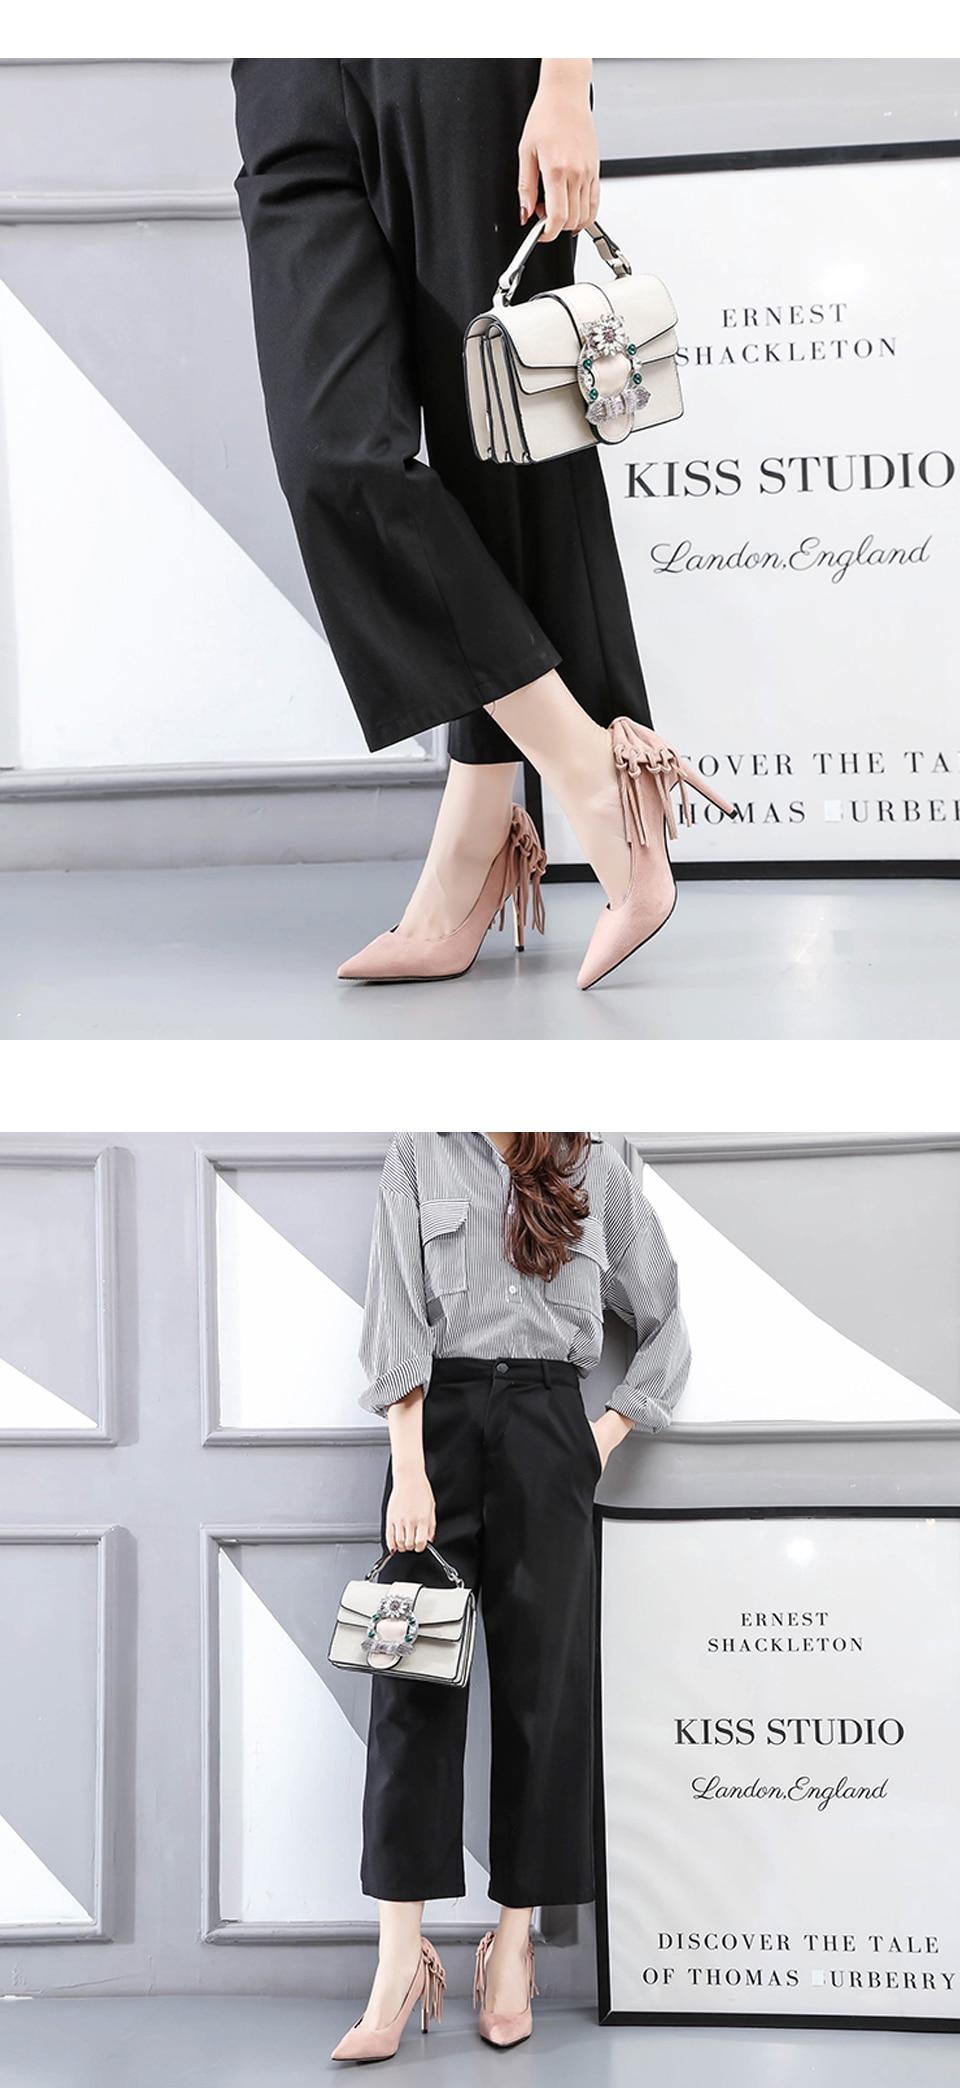 Woman Shoes High Heels Brand Women Pumps Tassel Fashion Office Lady Dress Shoes Black Spring Autumn Pointed Toe Female Pumps DE 5